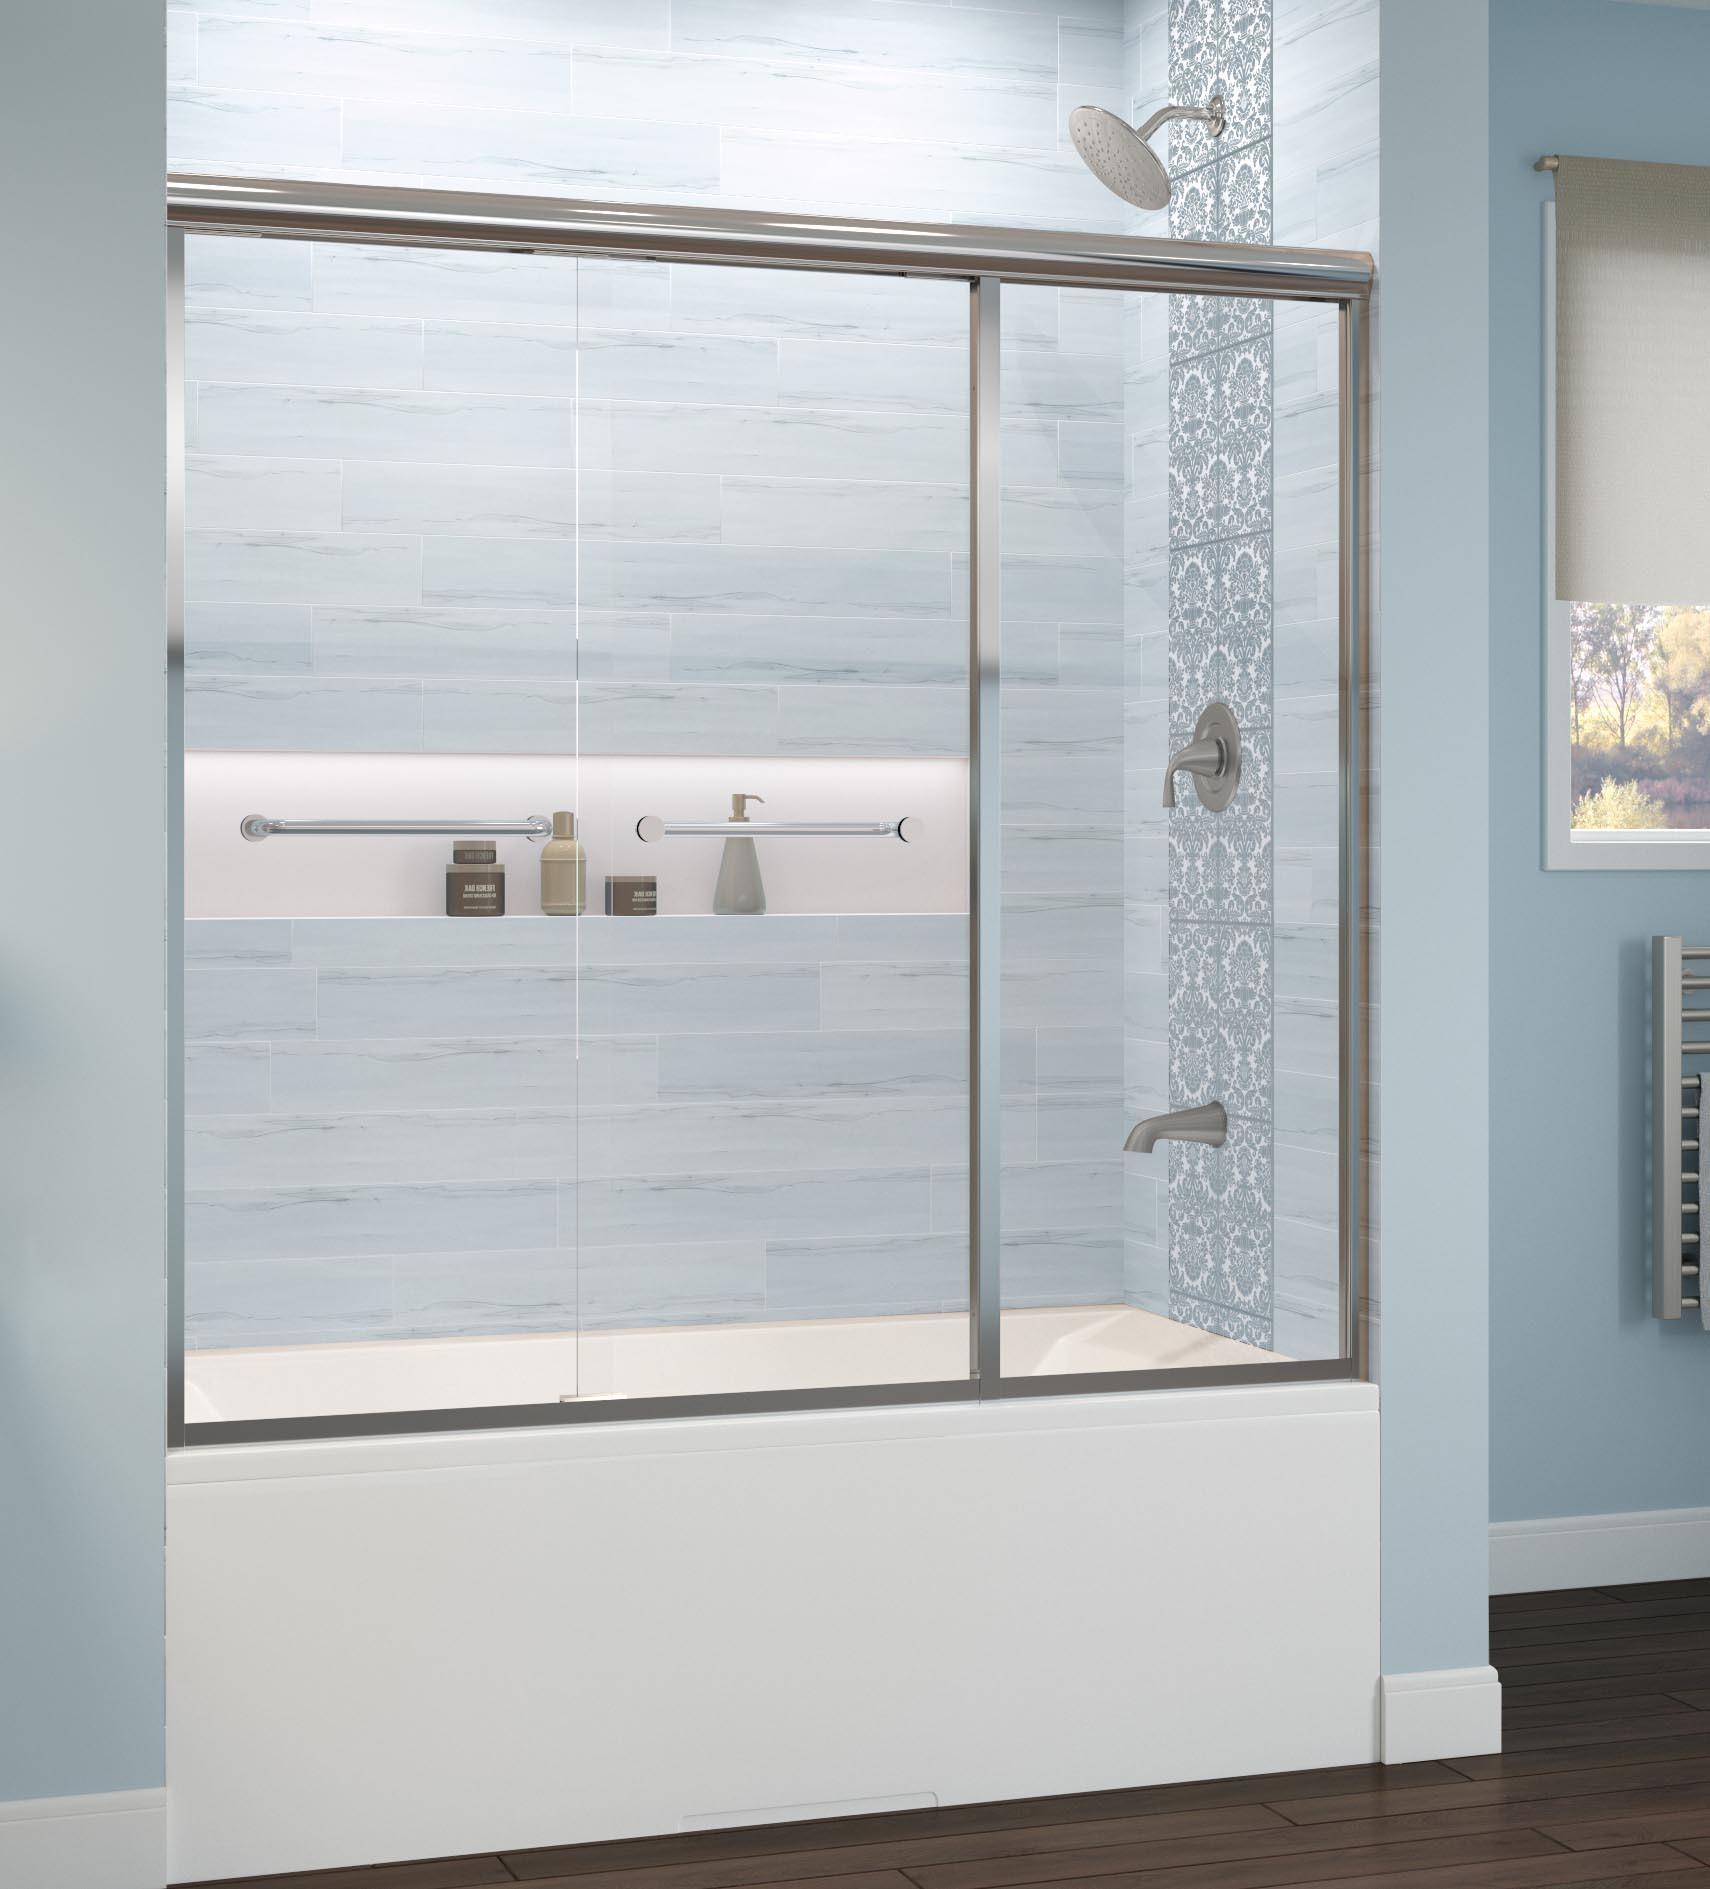 Infinity Semi Frameless 1 4 Inch Glass Sliding With Inline Panel Bath Tub Door Basco Shower Doors